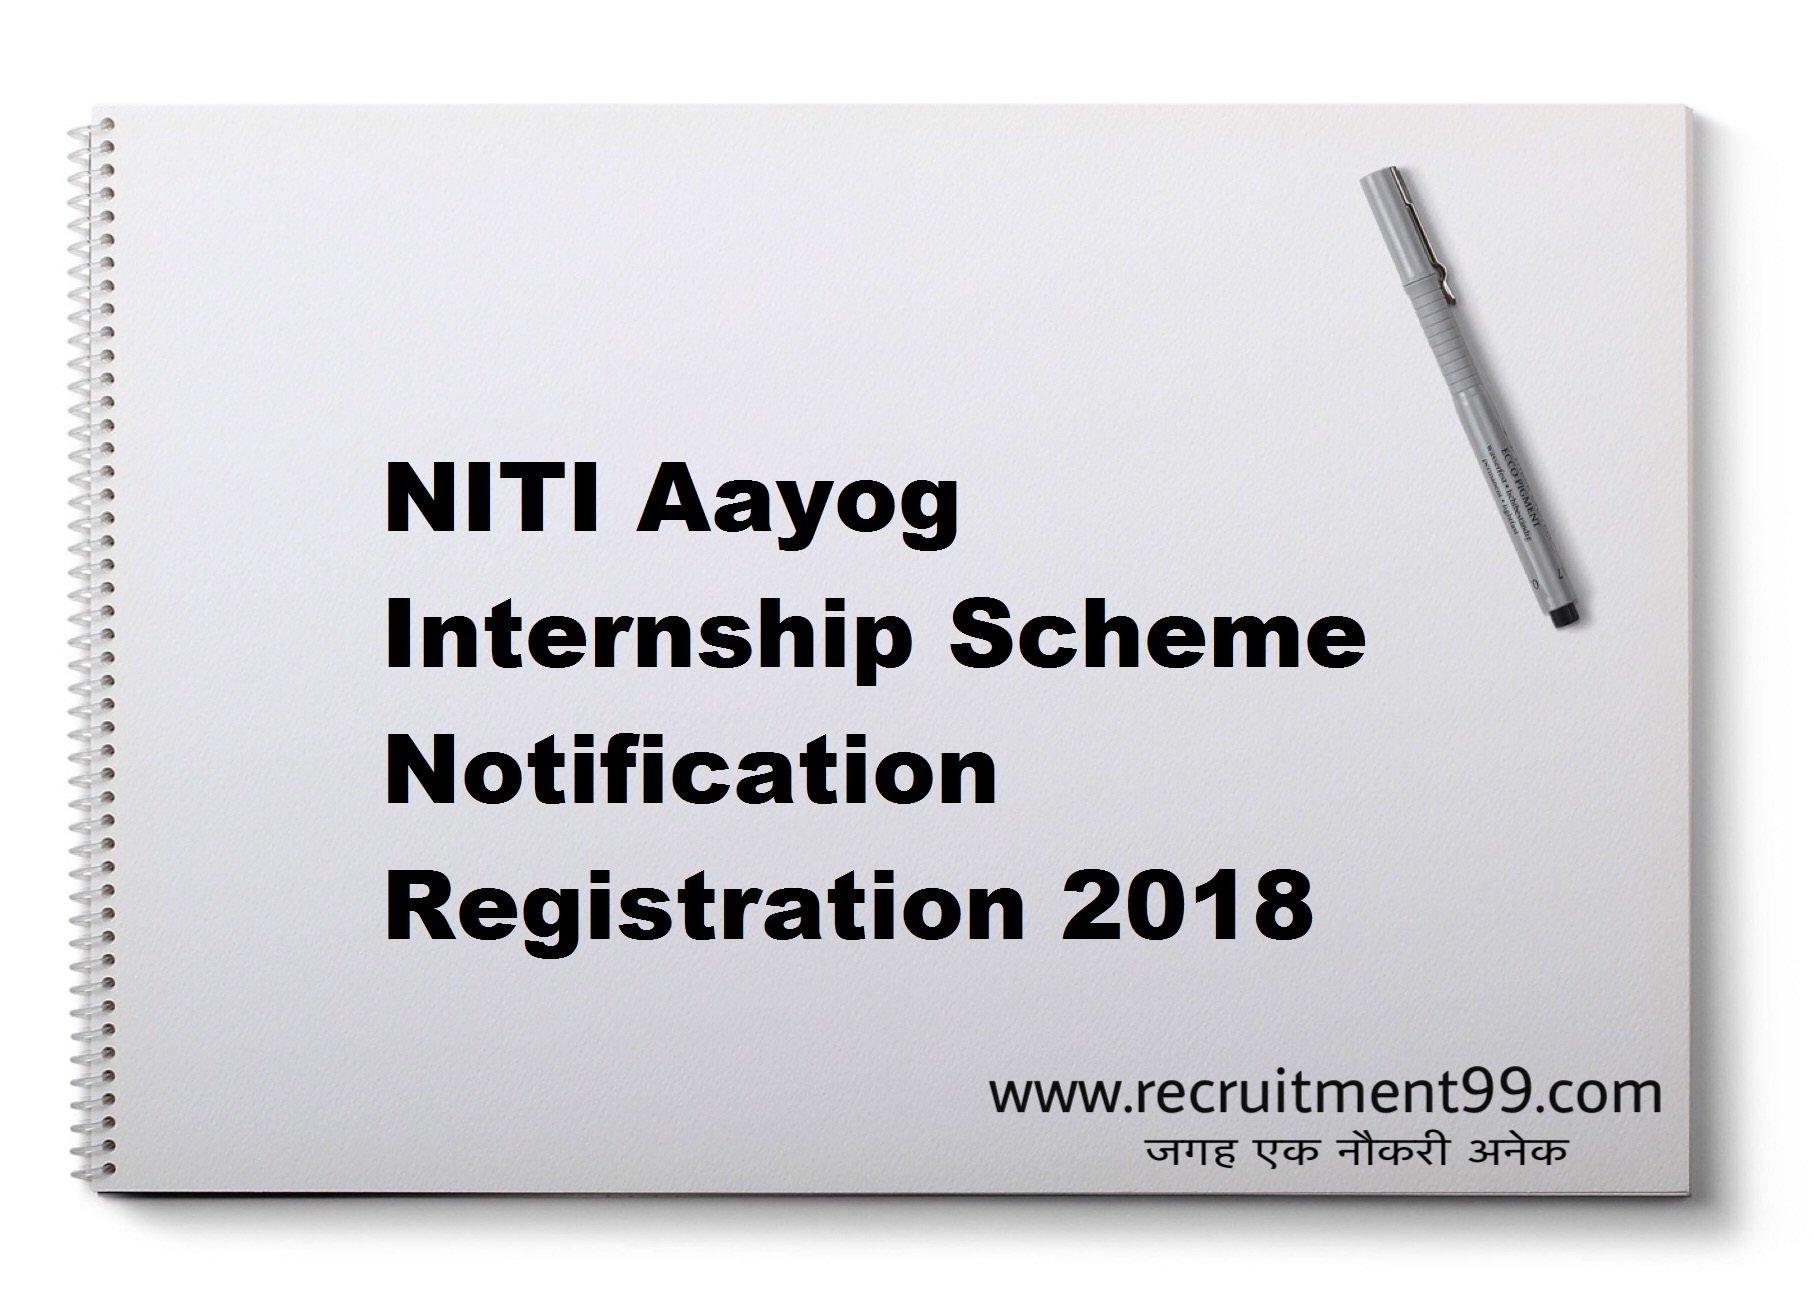 NITI Aayog Internship Scheme Notification Registration 2018